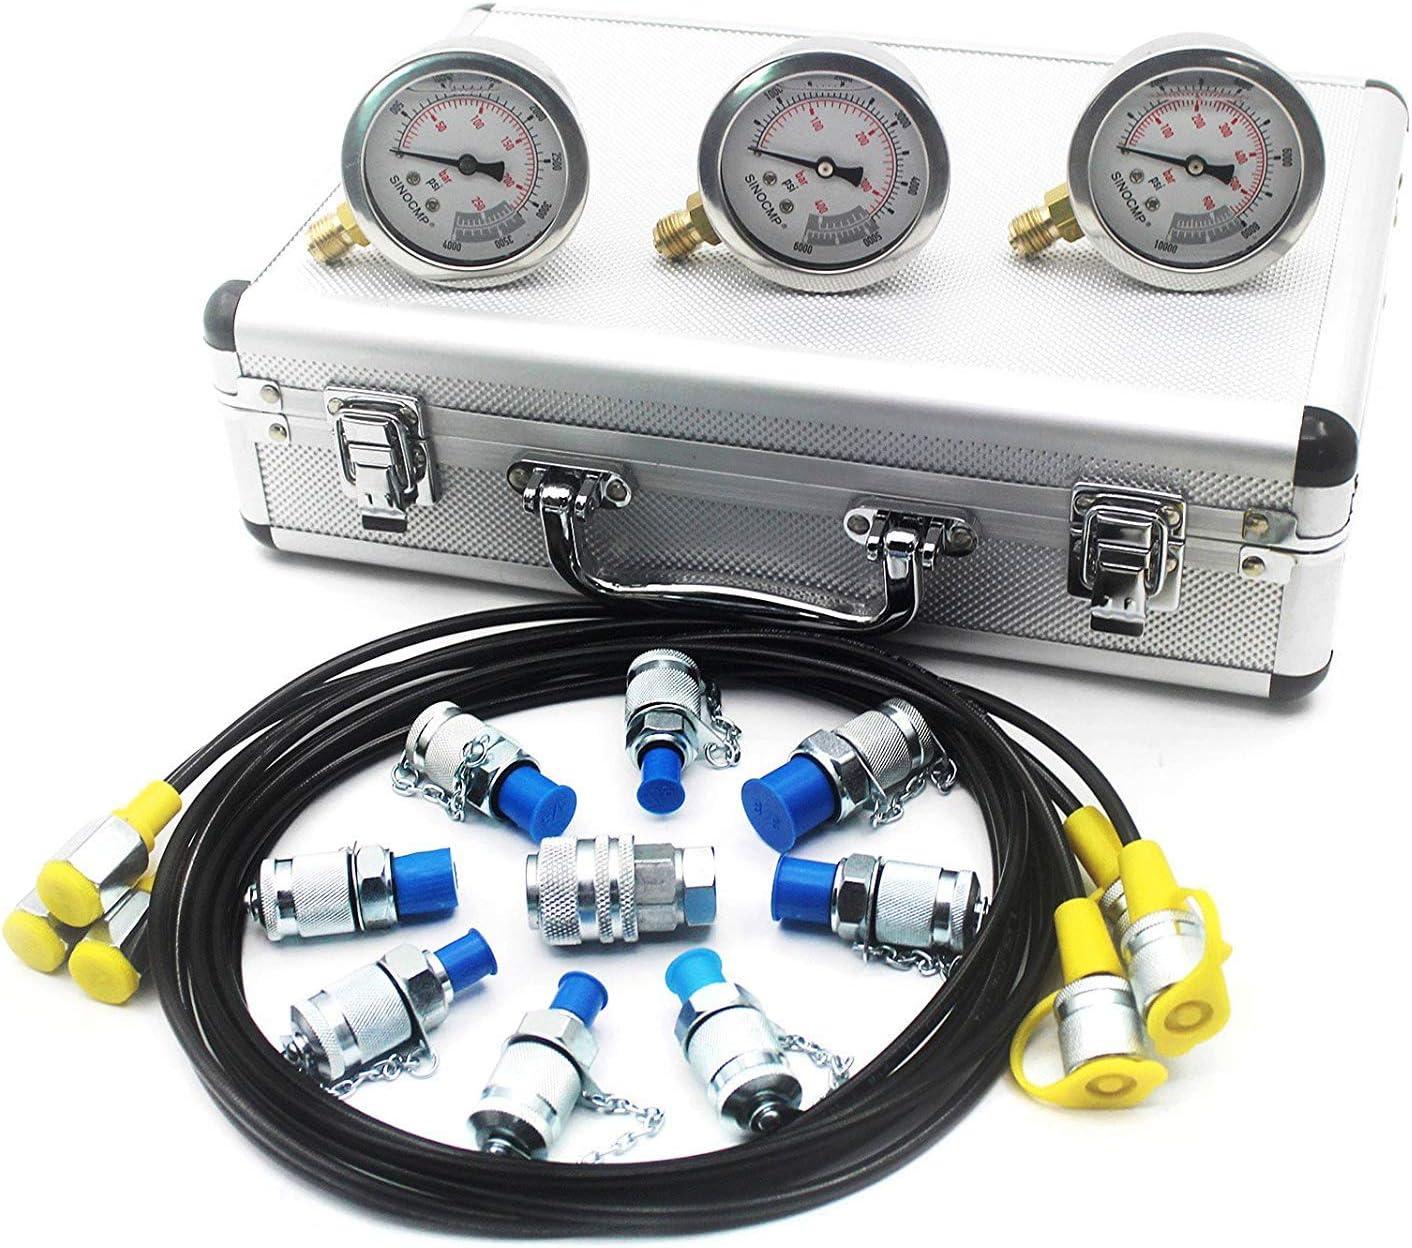 SINOCMP Hydraulic Pressure Test Pre 25% OFF Baltimore Mall Kit Gauge